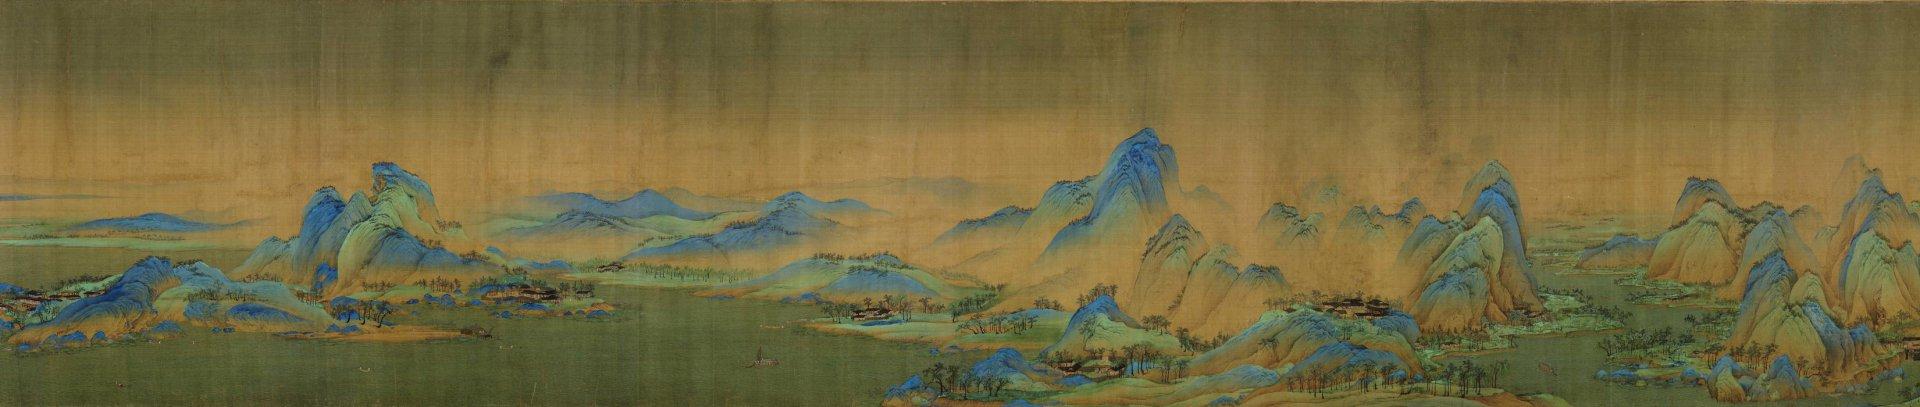 2.tWang_Ximeng_-_A_Thousand_Li_of_River1.jpg